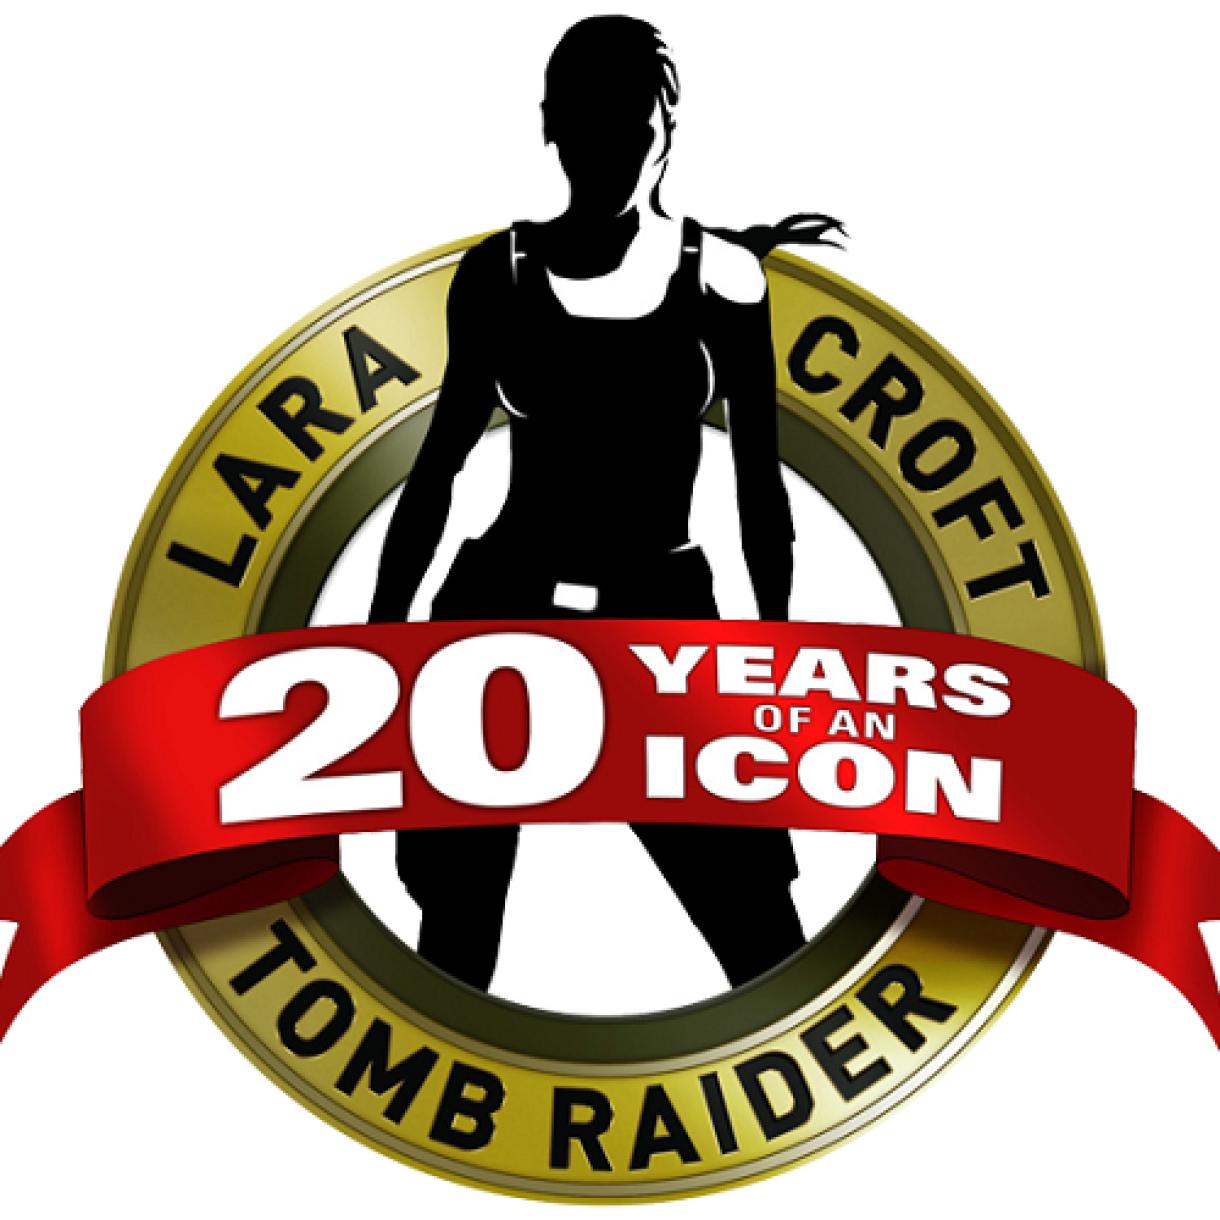 CELEBRATING 20 YEARS OF TOMB RAIDER AT E3 2016